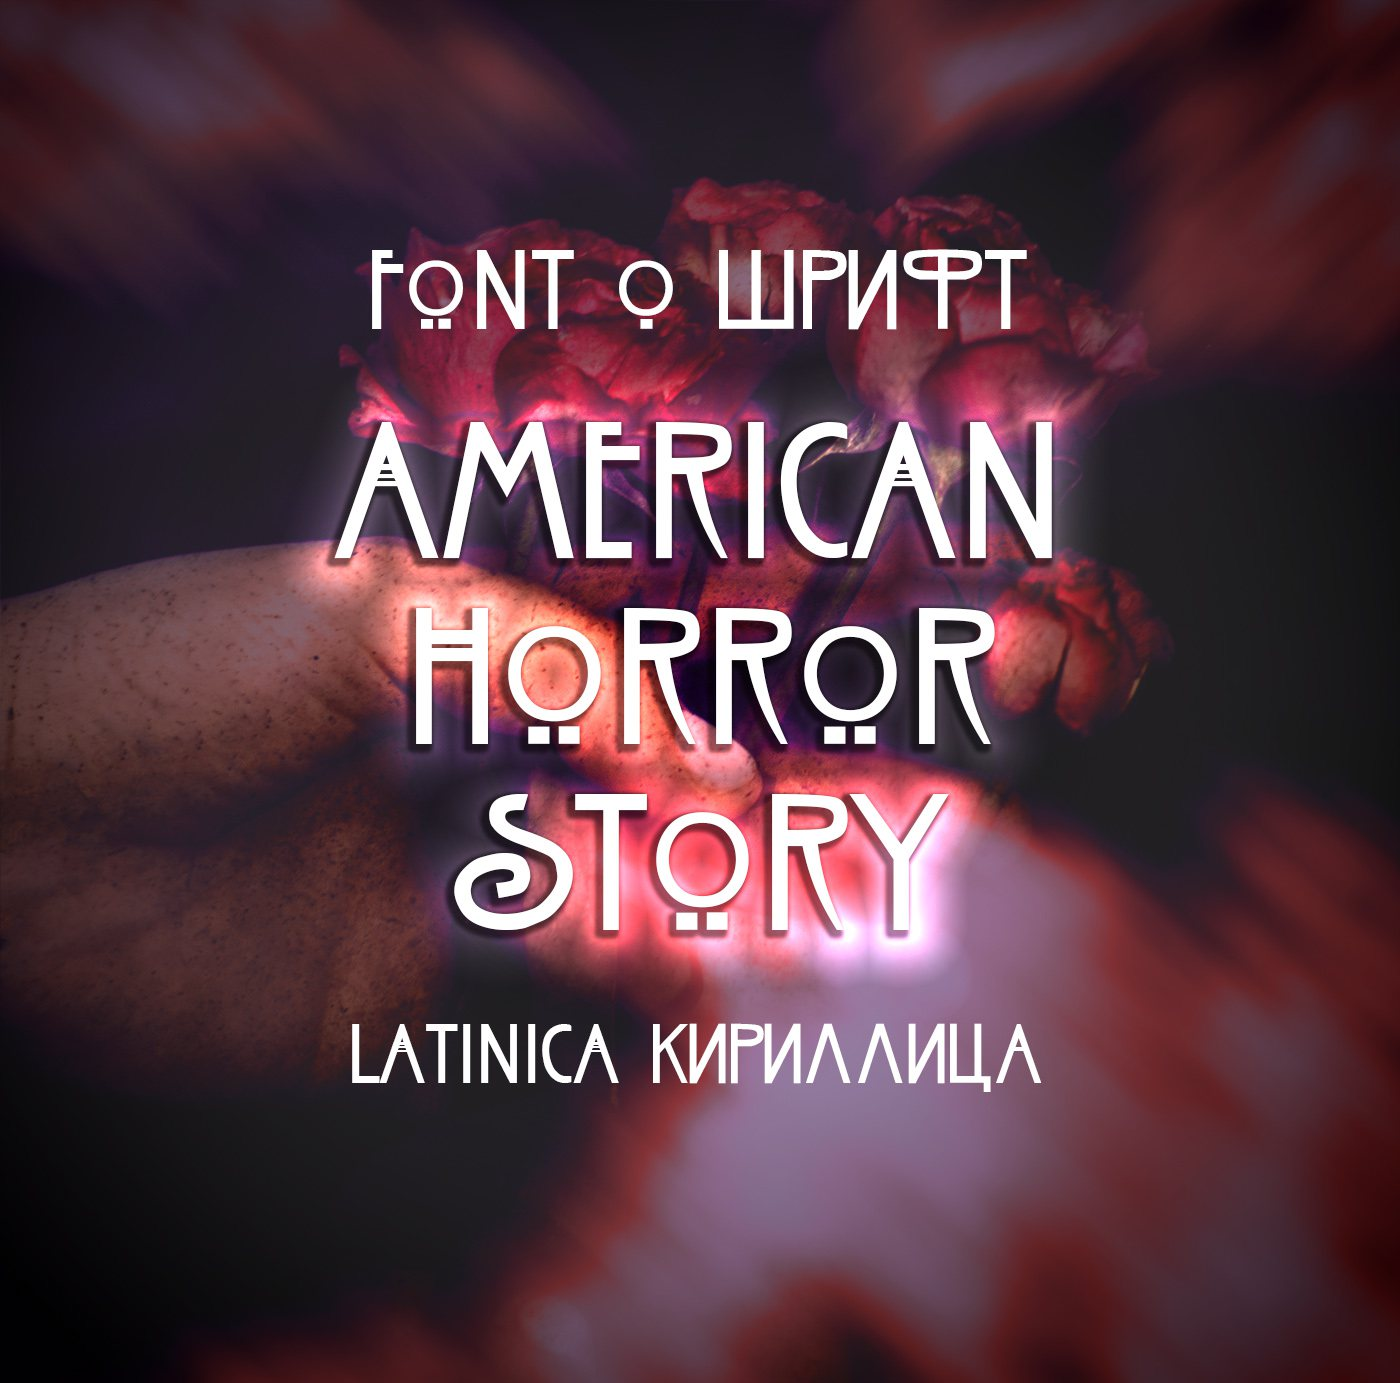 Шрифт American Horror Story Cyrillic